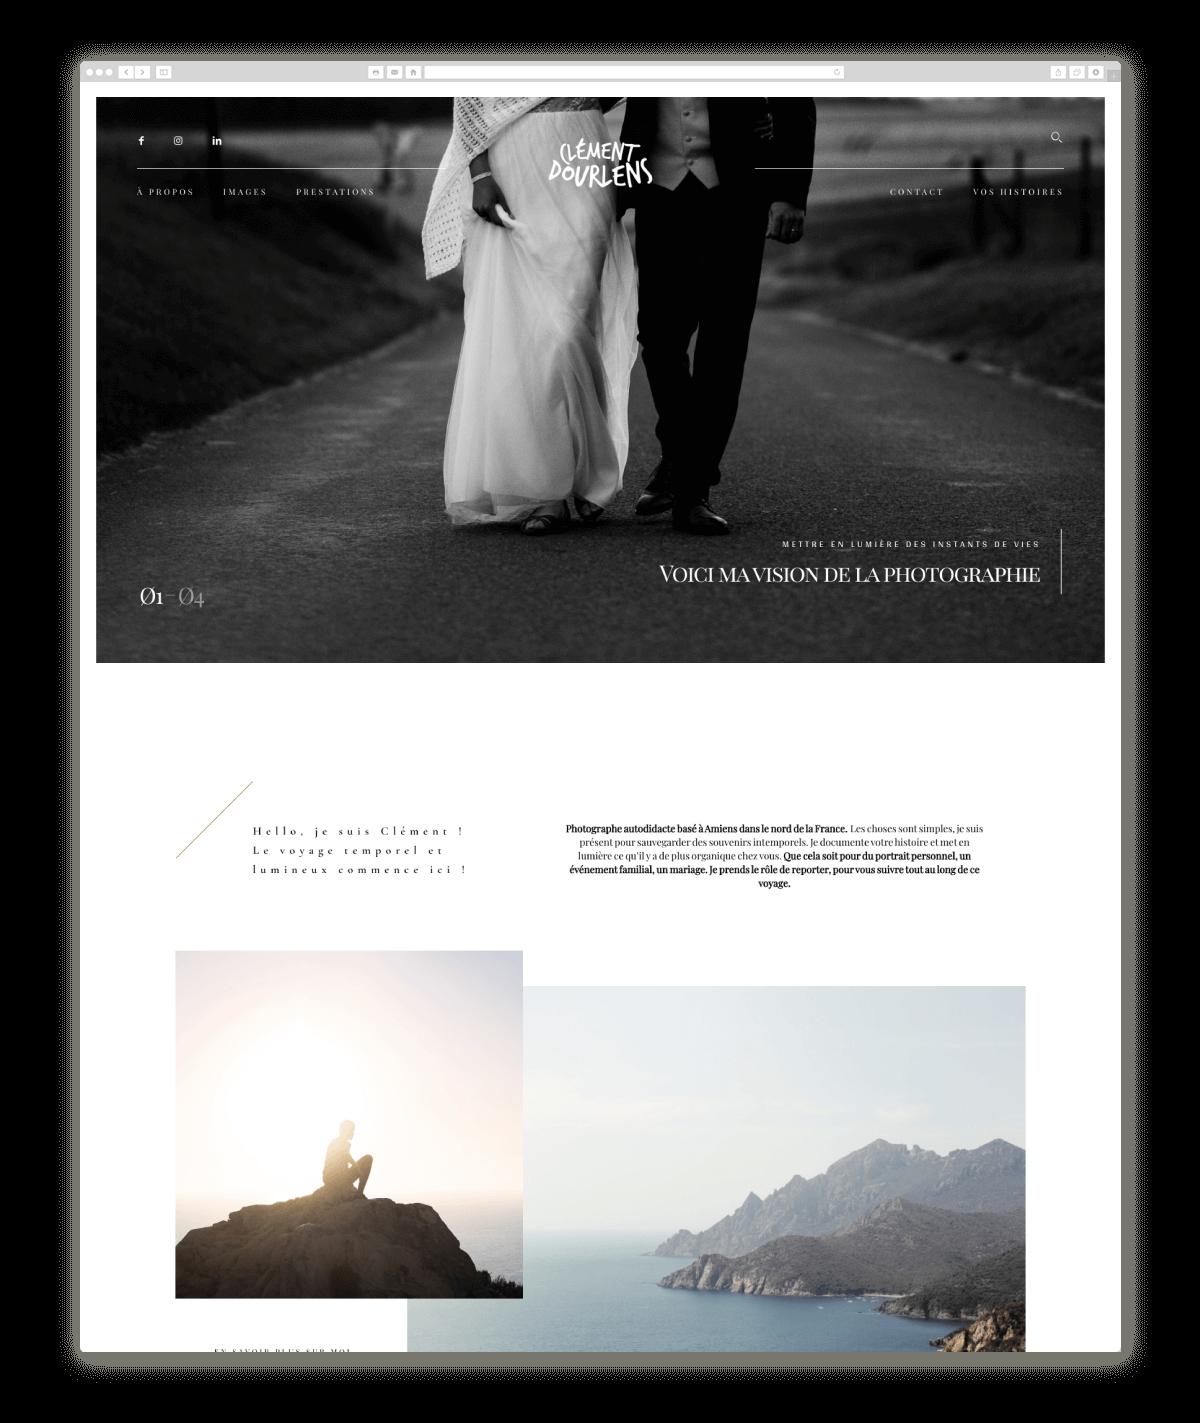 wedding photography website design clementdourlens.com